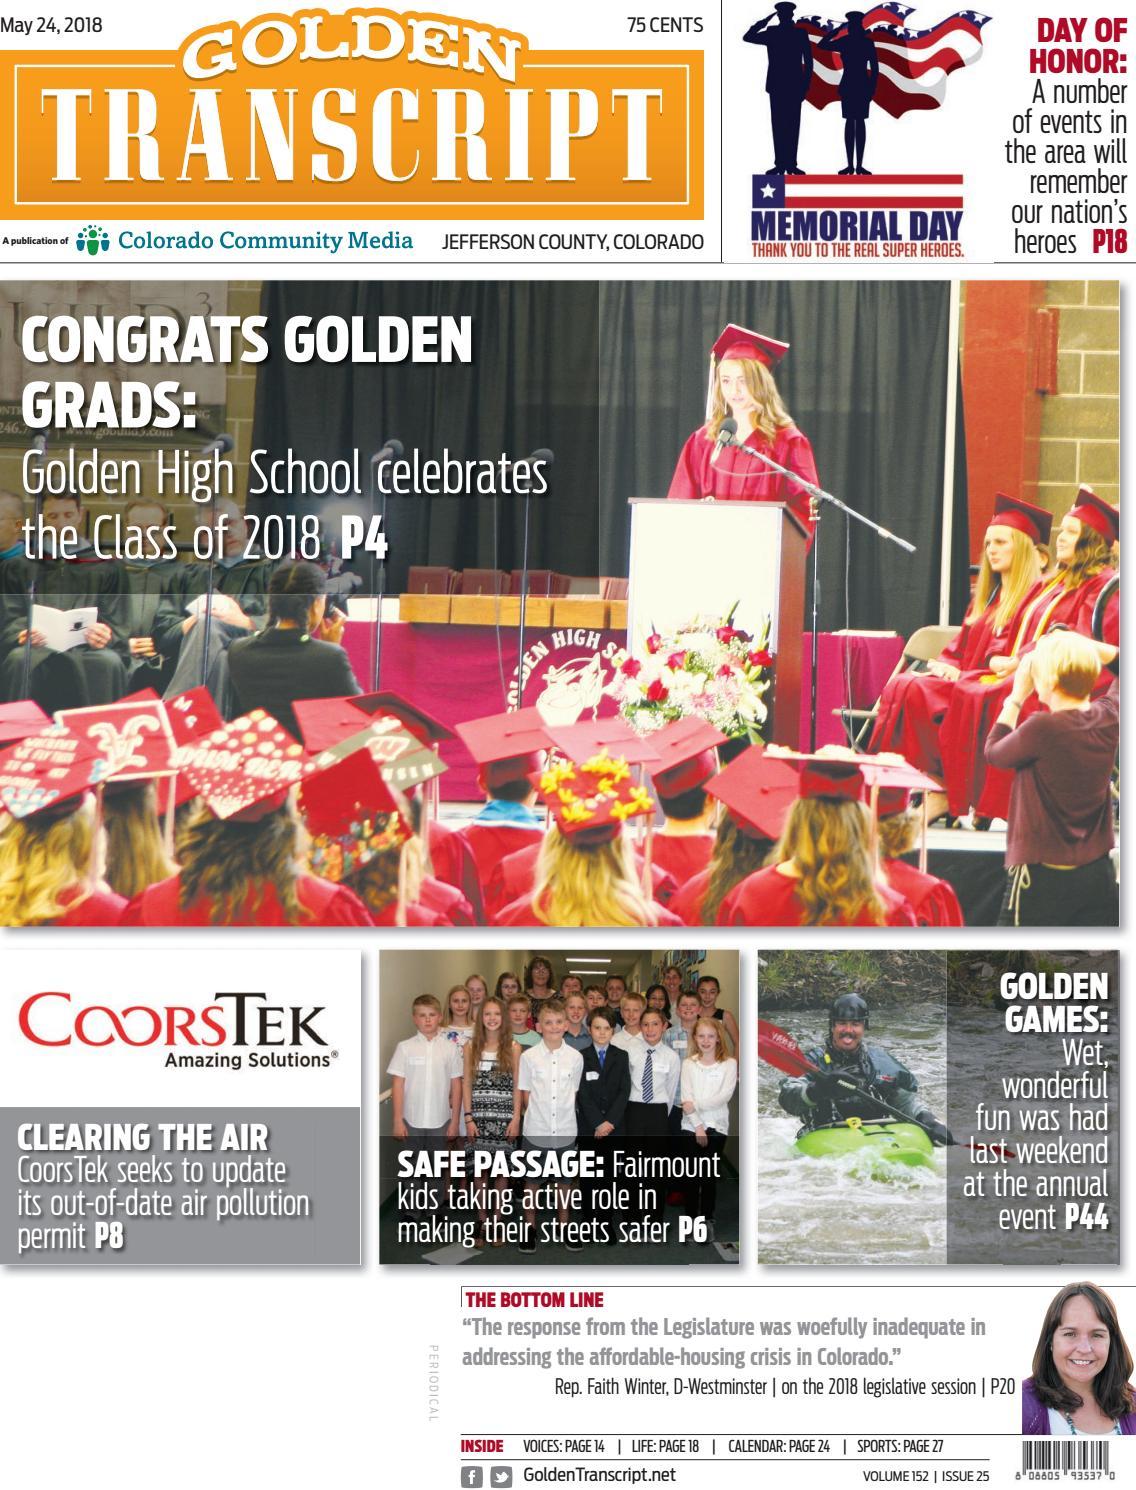 Allene Simmons golden transcript 0524colorado community media - issuu